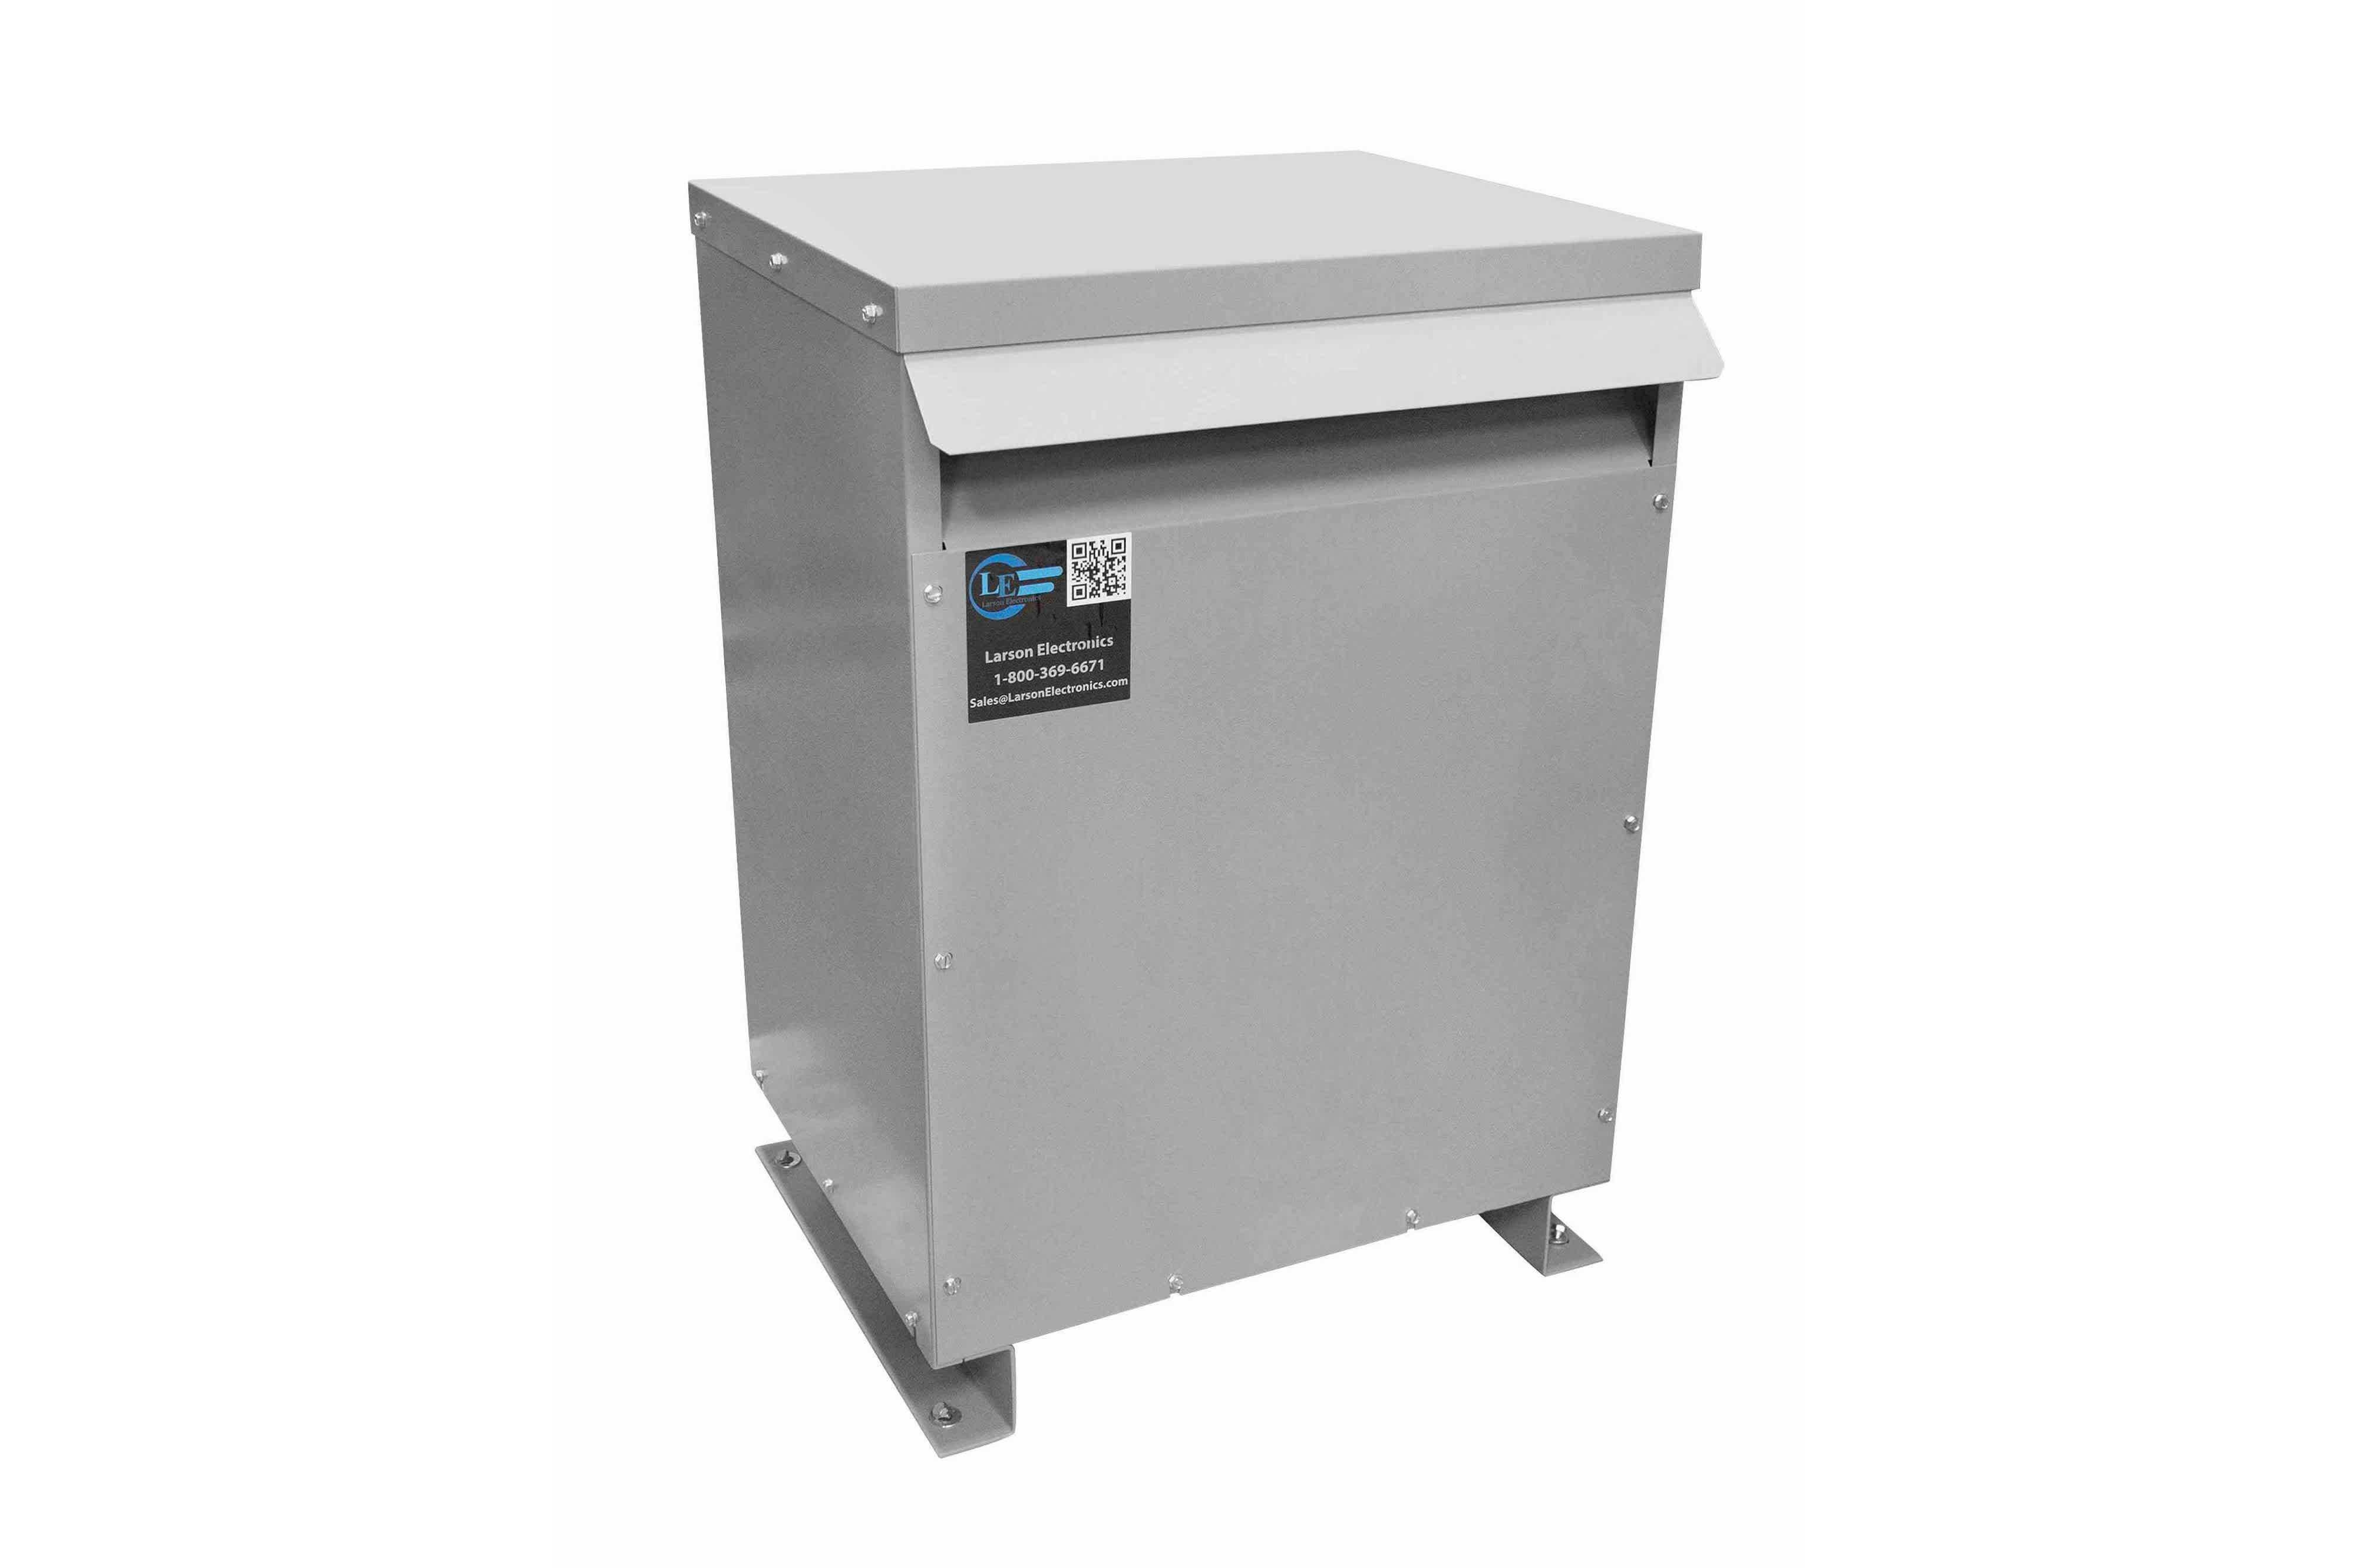 18 kVA 3PH Isolation Transformer, 415V Wye Primary, 208Y/120 Wye-N Secondary, N3R, Ventilated, 60 Hz